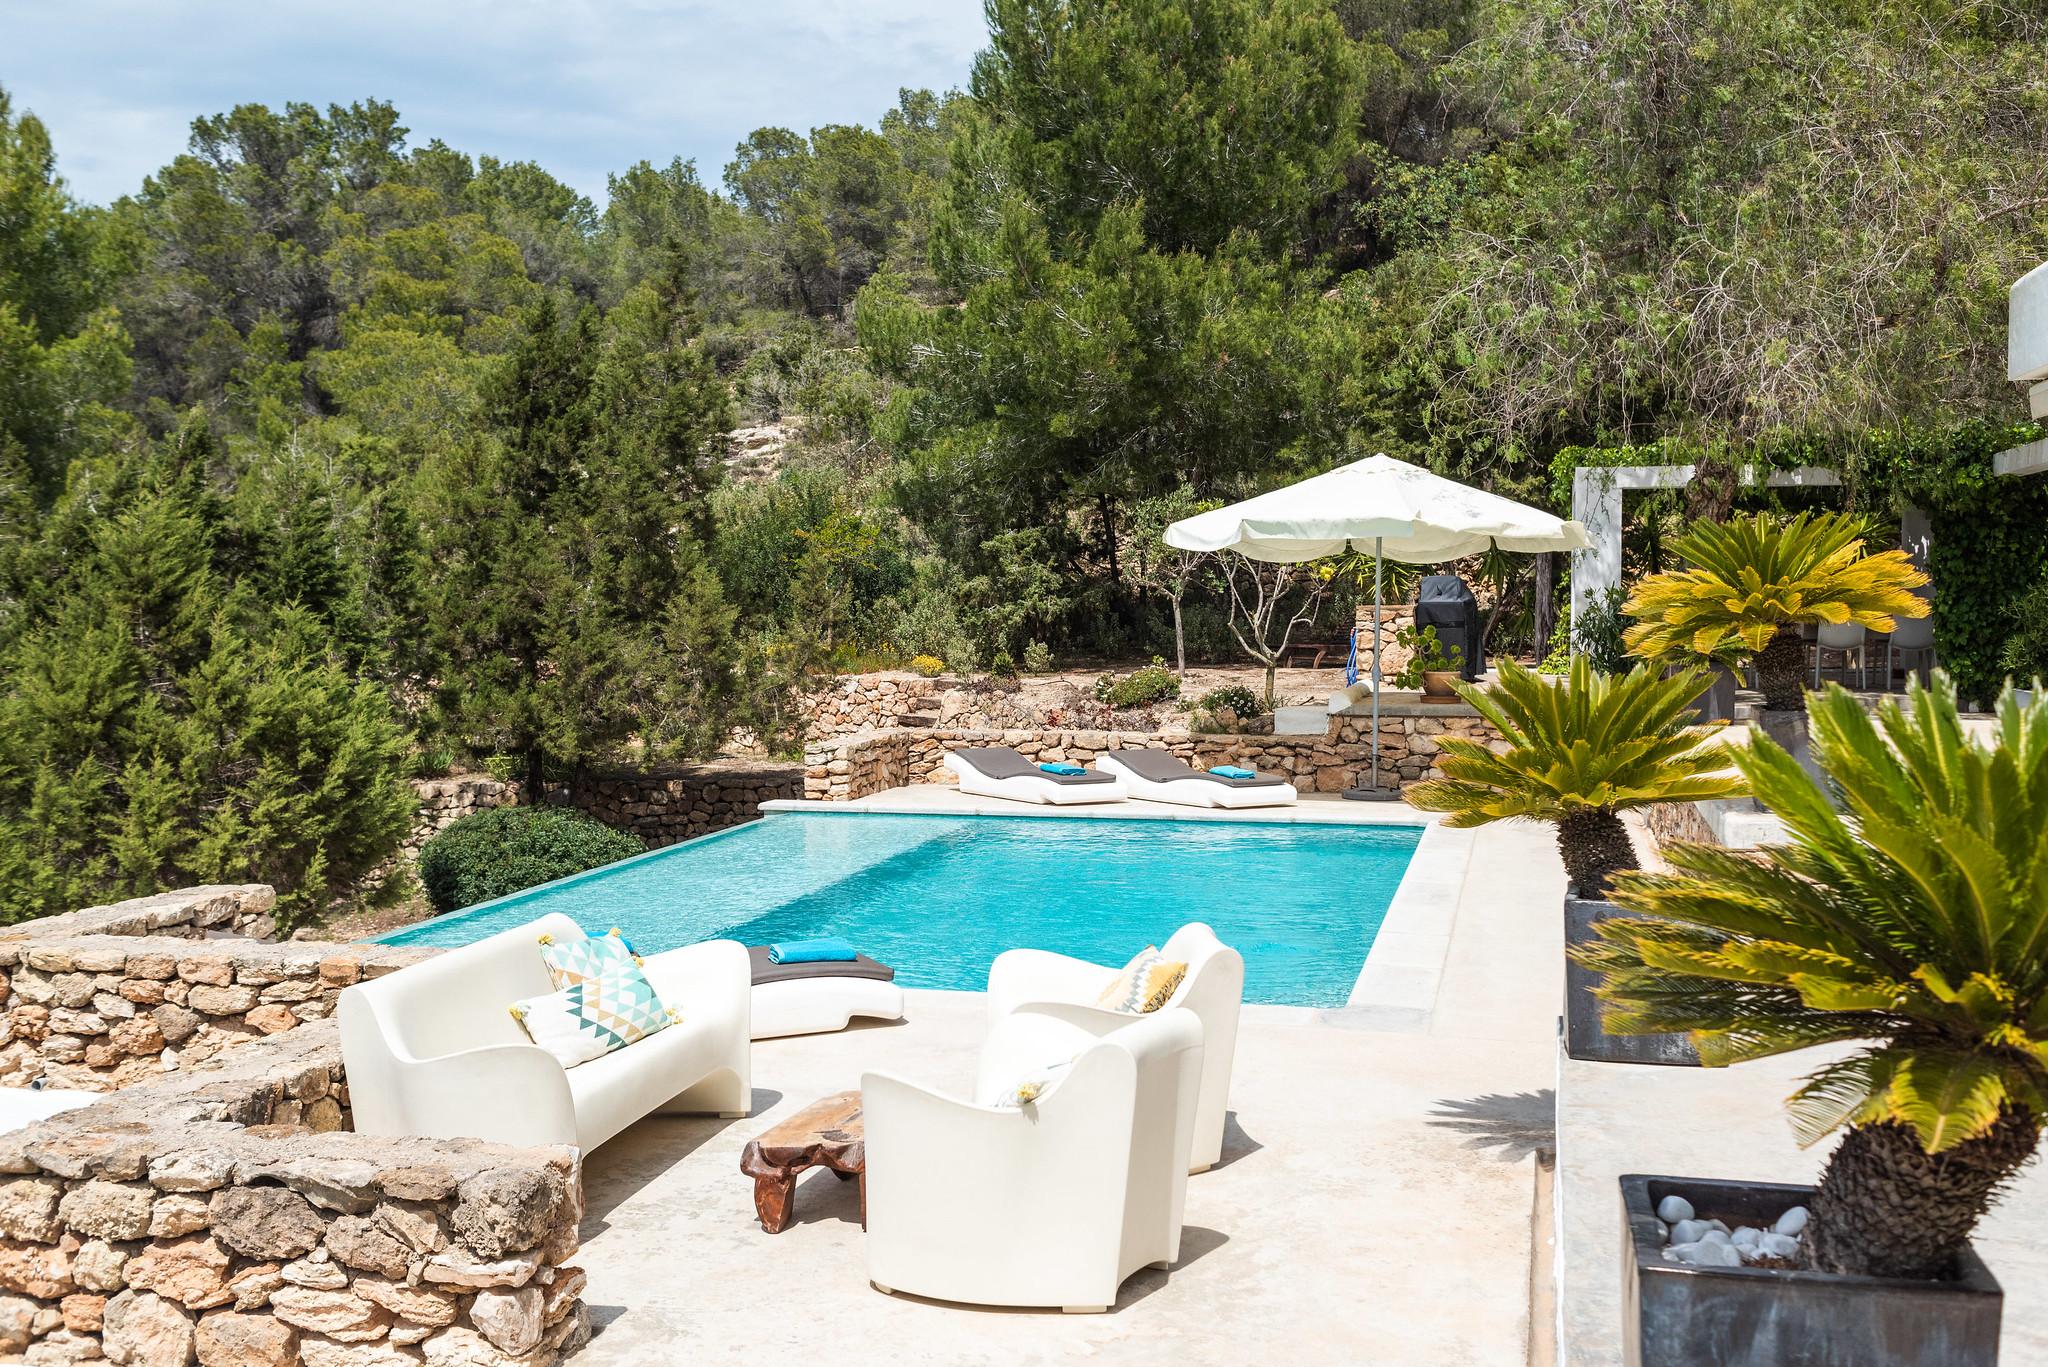 https://www.white-ibiza.com/wp-content/uploads/2020/06/white-ibiza-villas-villa-azul-exterior-pool3.jpg